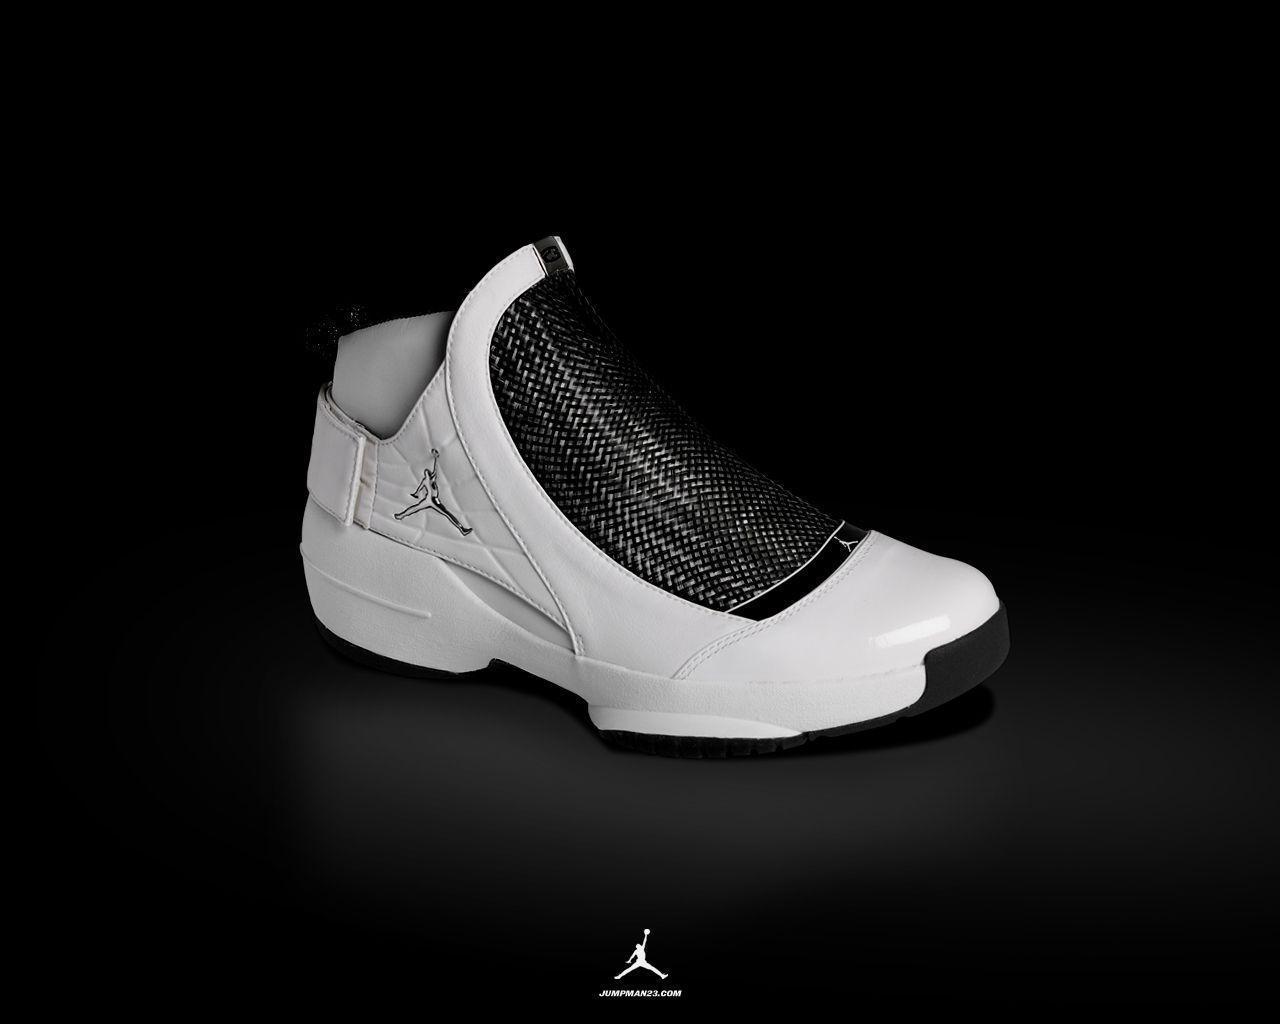 cbcb9ecff646a Nike Air Jordan 3 Retro Achat Vente Pas Cher